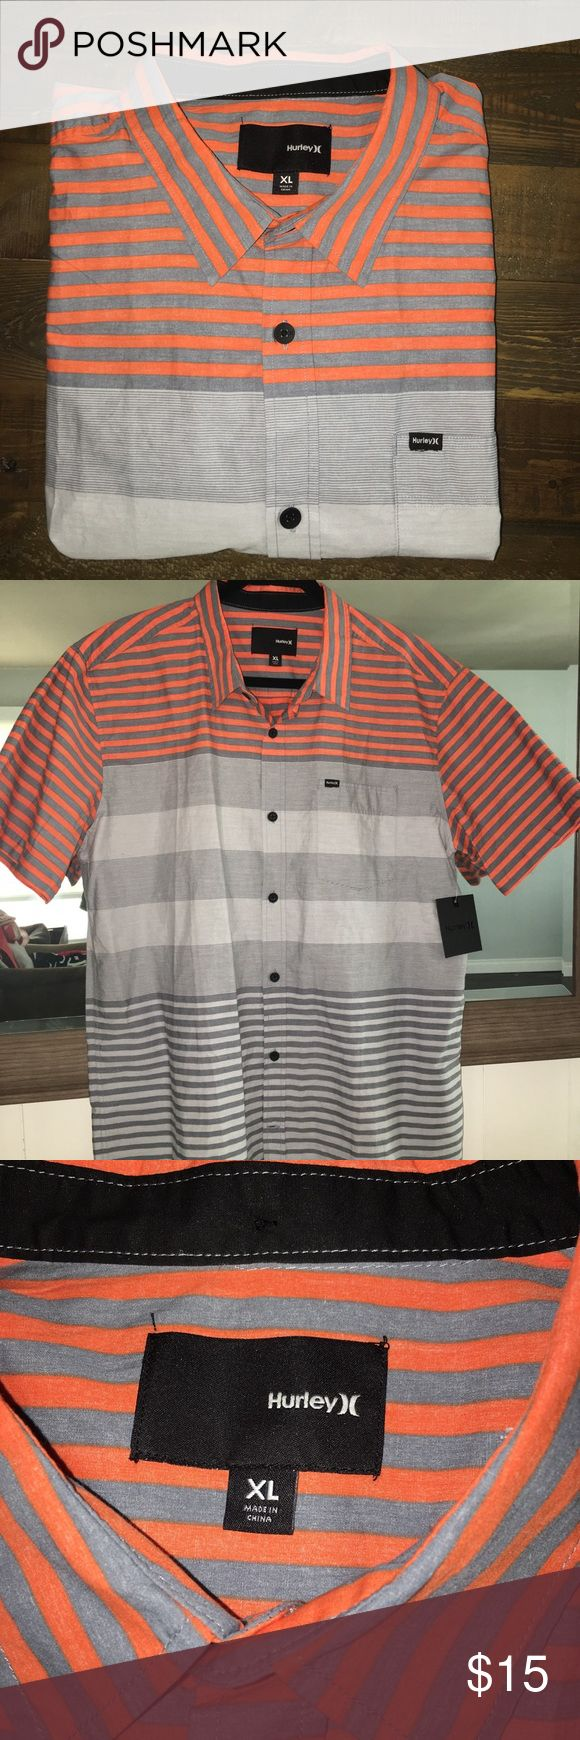 Men's Hurley shirt Never worn, Men's XL casual button shirt with collar Hurley Shirts Casual Button Down Shirts